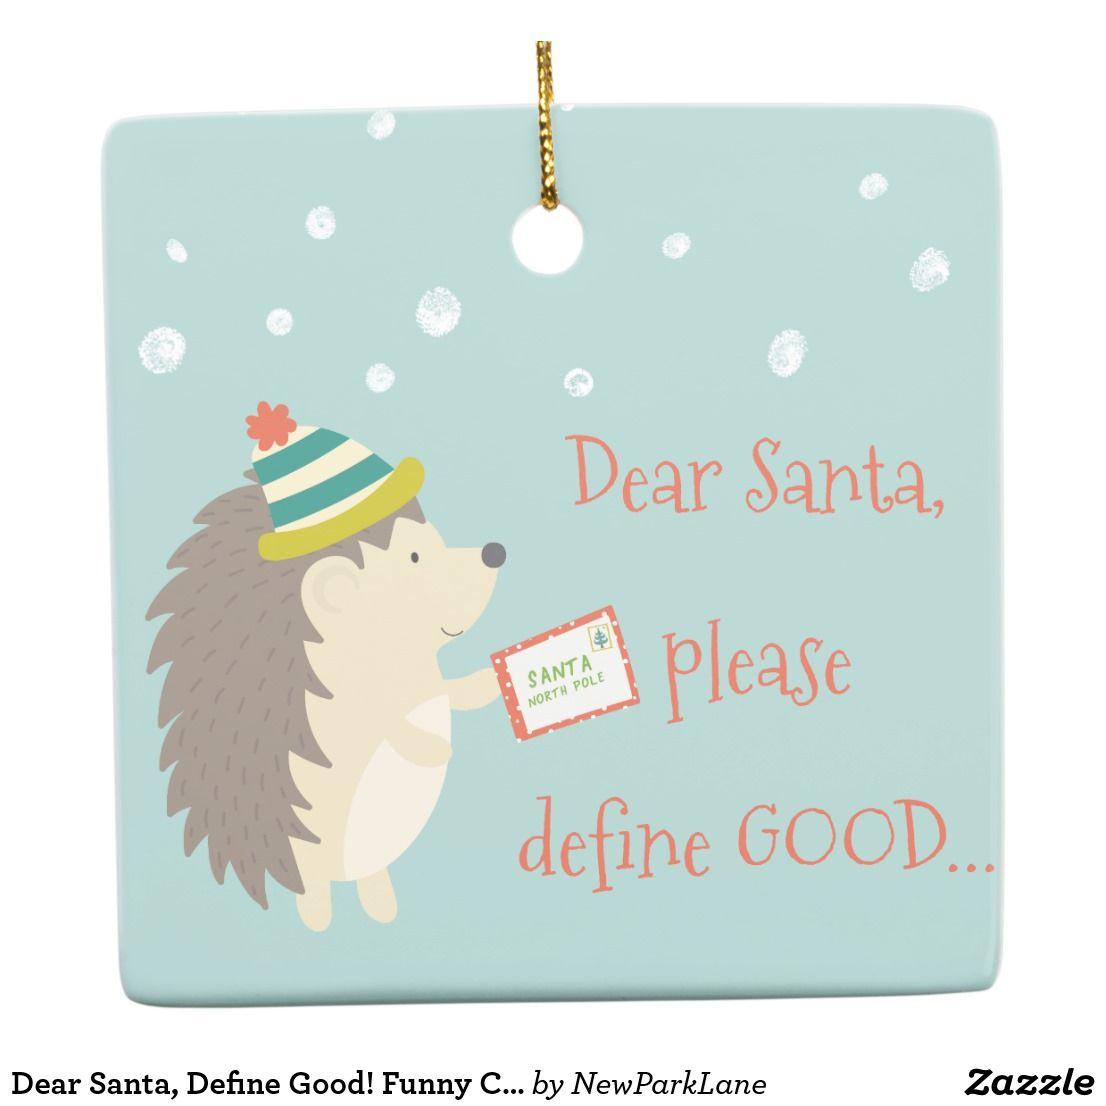 Dear Santa Define Good Funny Christmas Ceramic Ornament Zazzle Com Ceramic Ornaments Christmas Humor Dear Santa